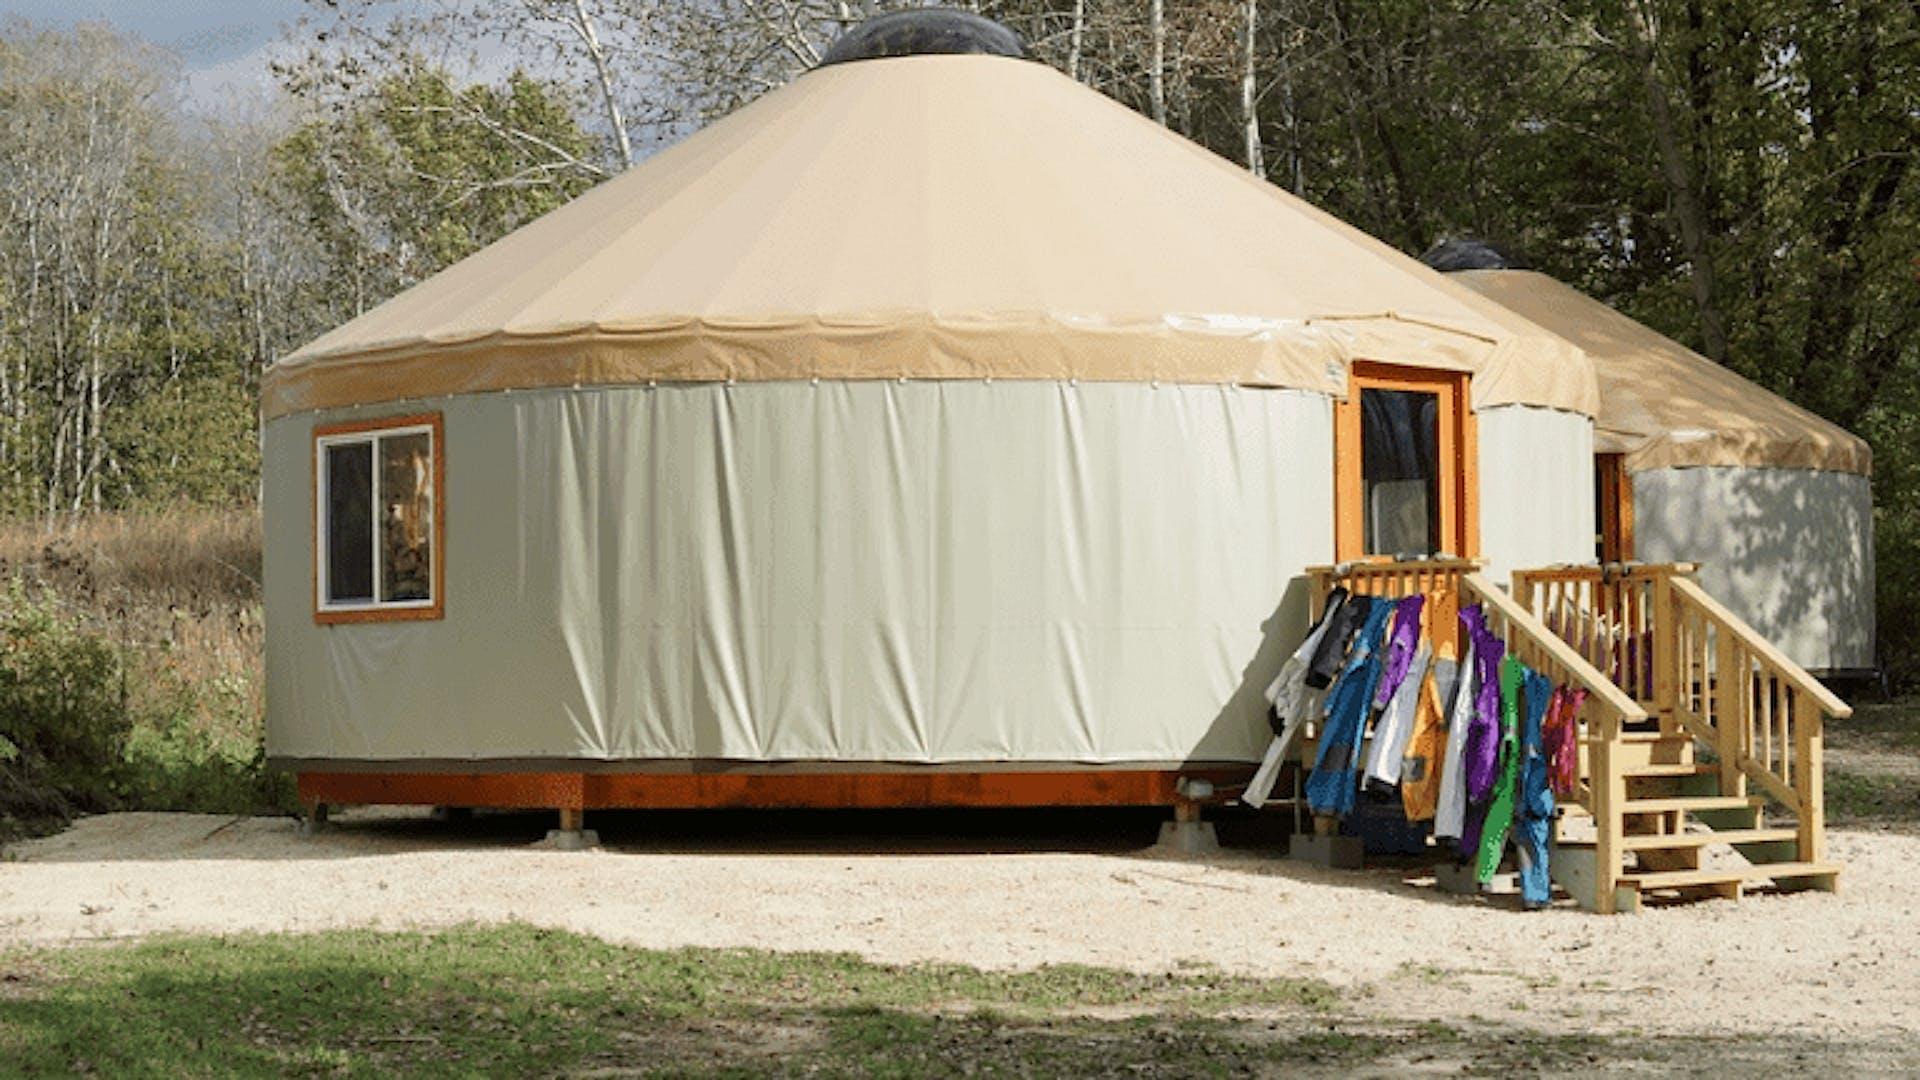 Yurt classrooms coats